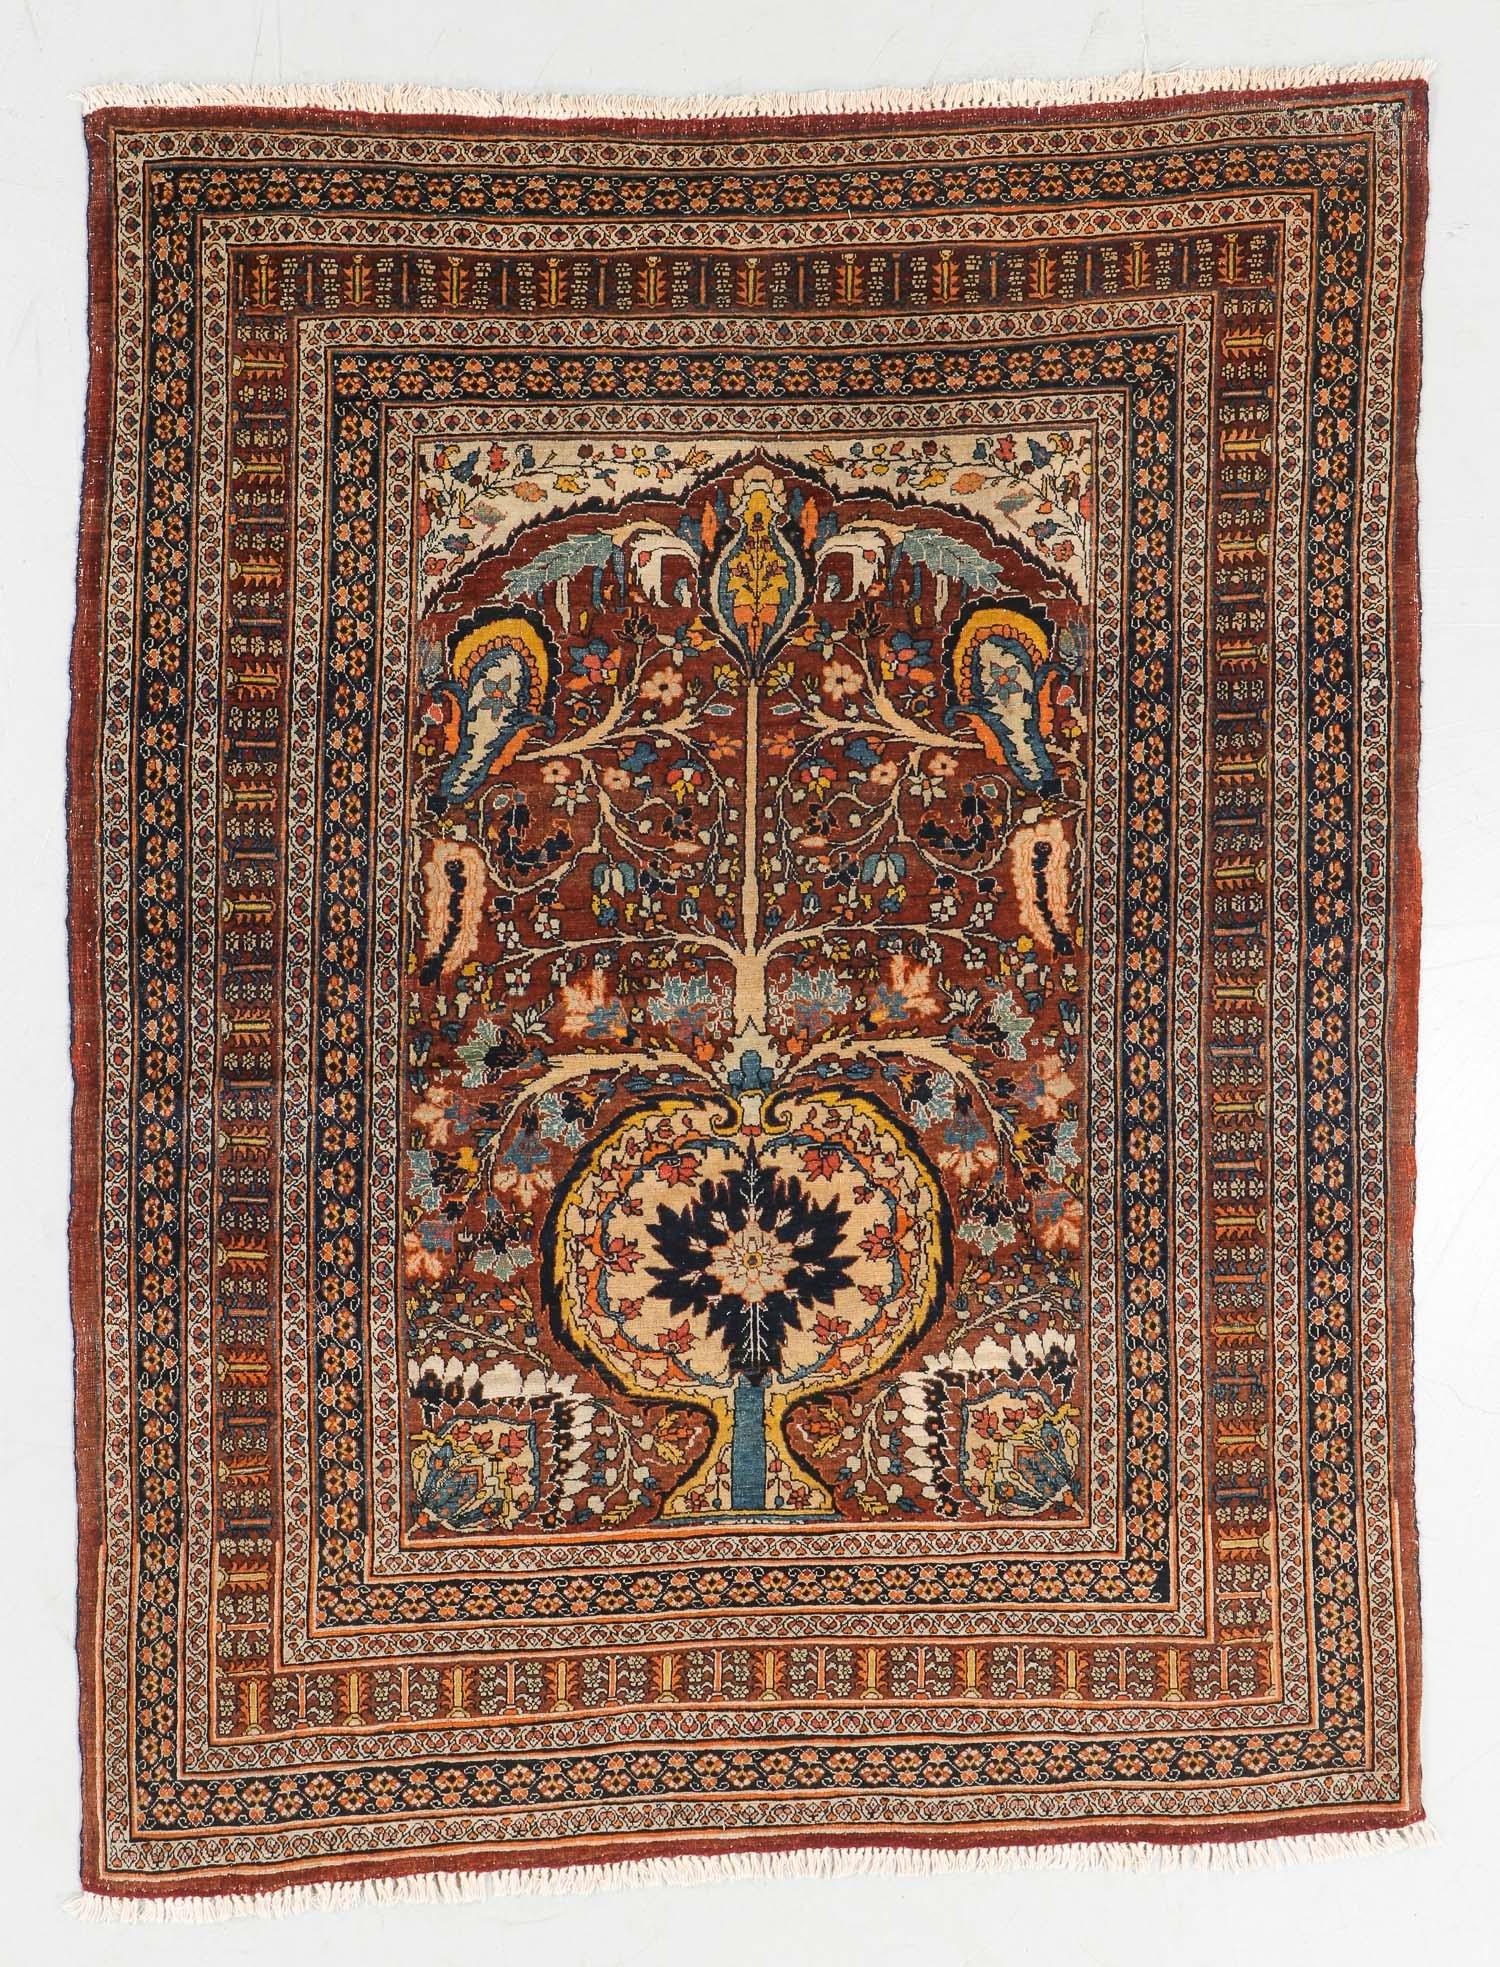 Antique Tabriz Prayer Rug, Persia: 4'5'' x 5'11''